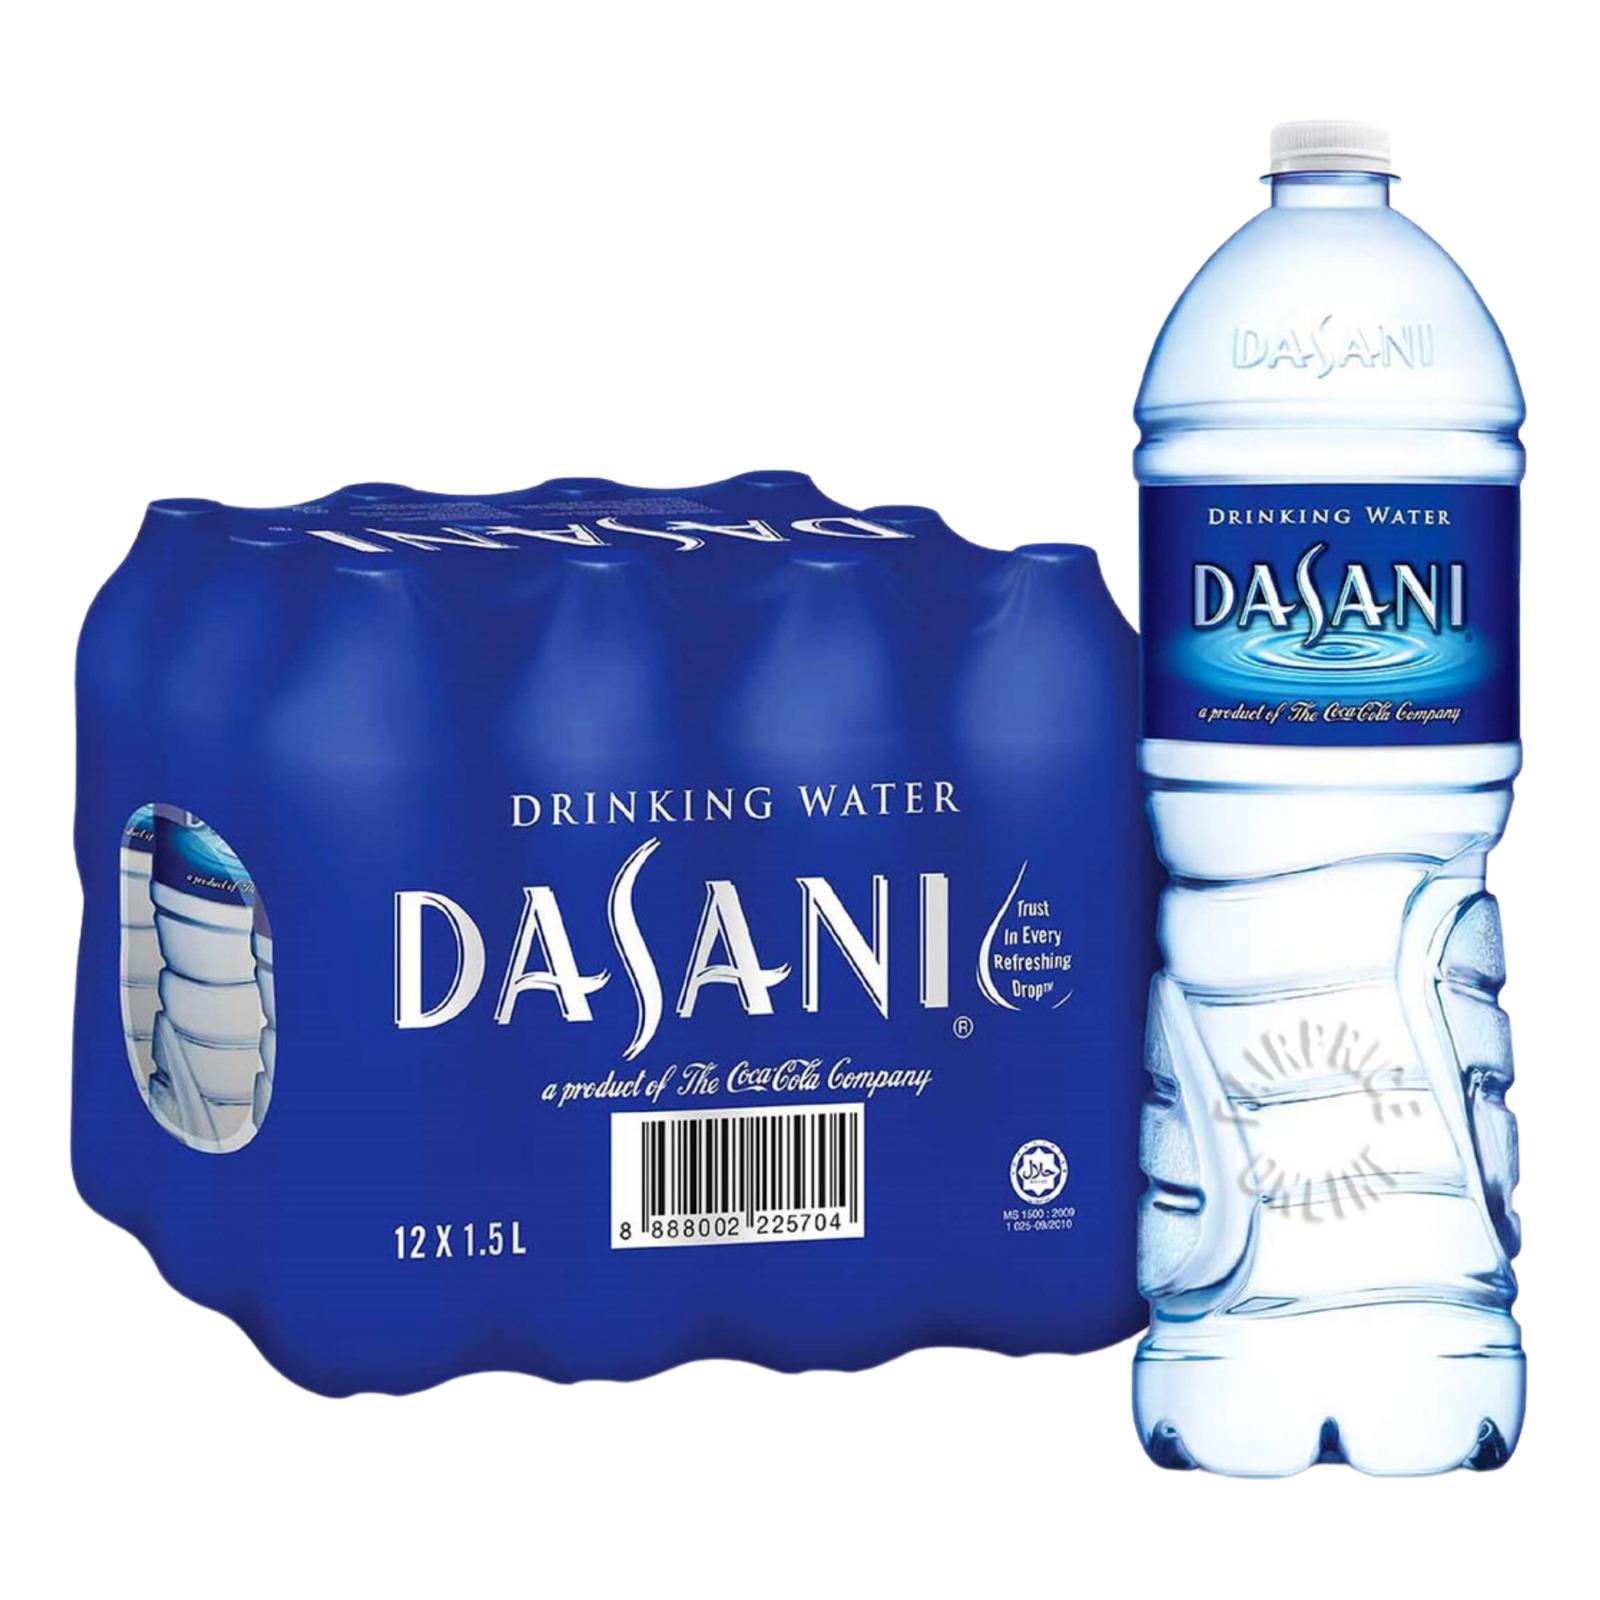 DASANI Drinking Water 12sX1.5L